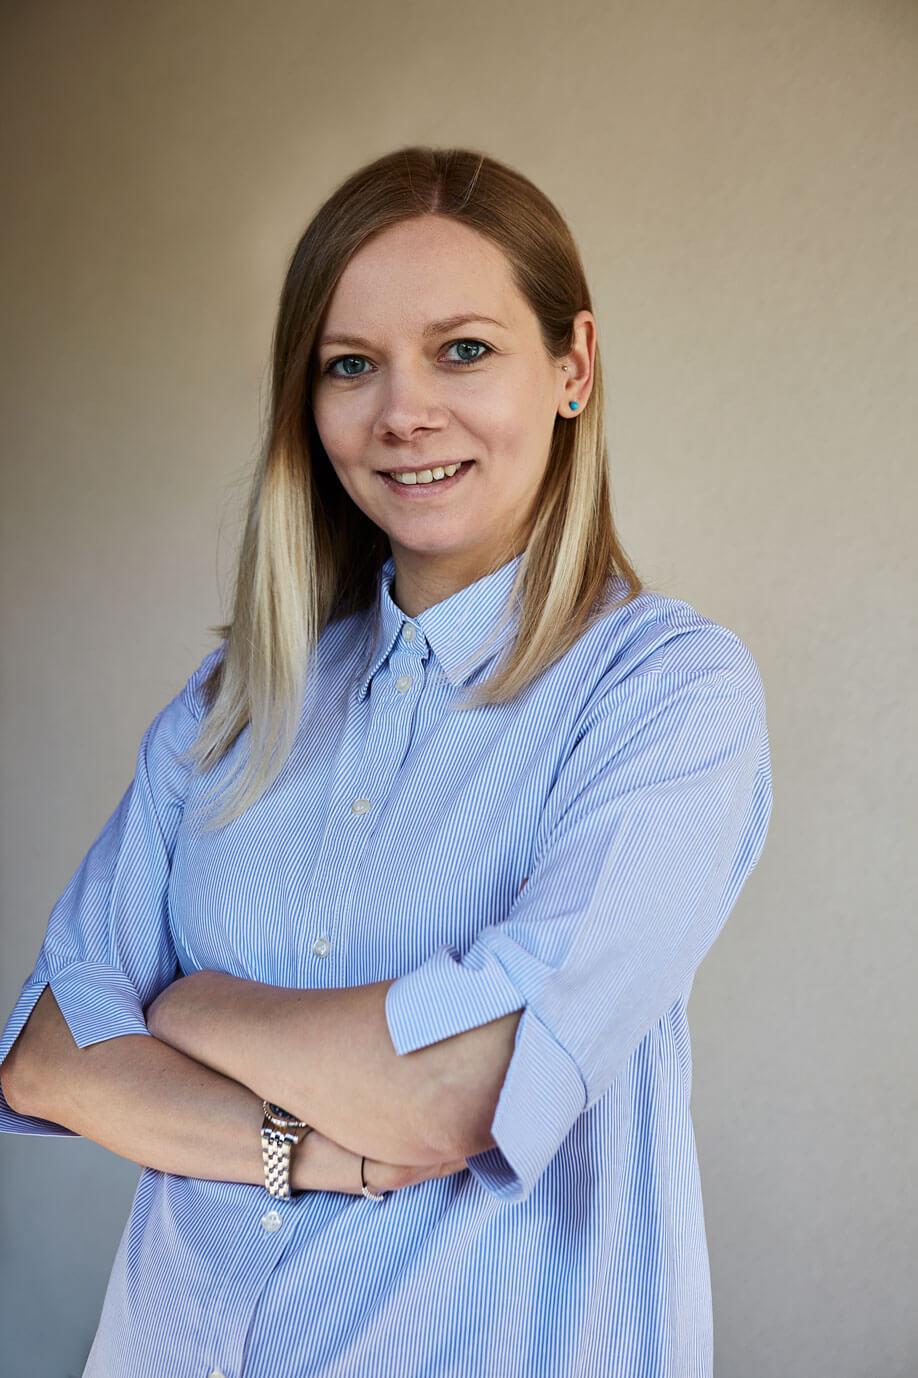 Profile portrait of Georgiana Frunze, Physiotherapist